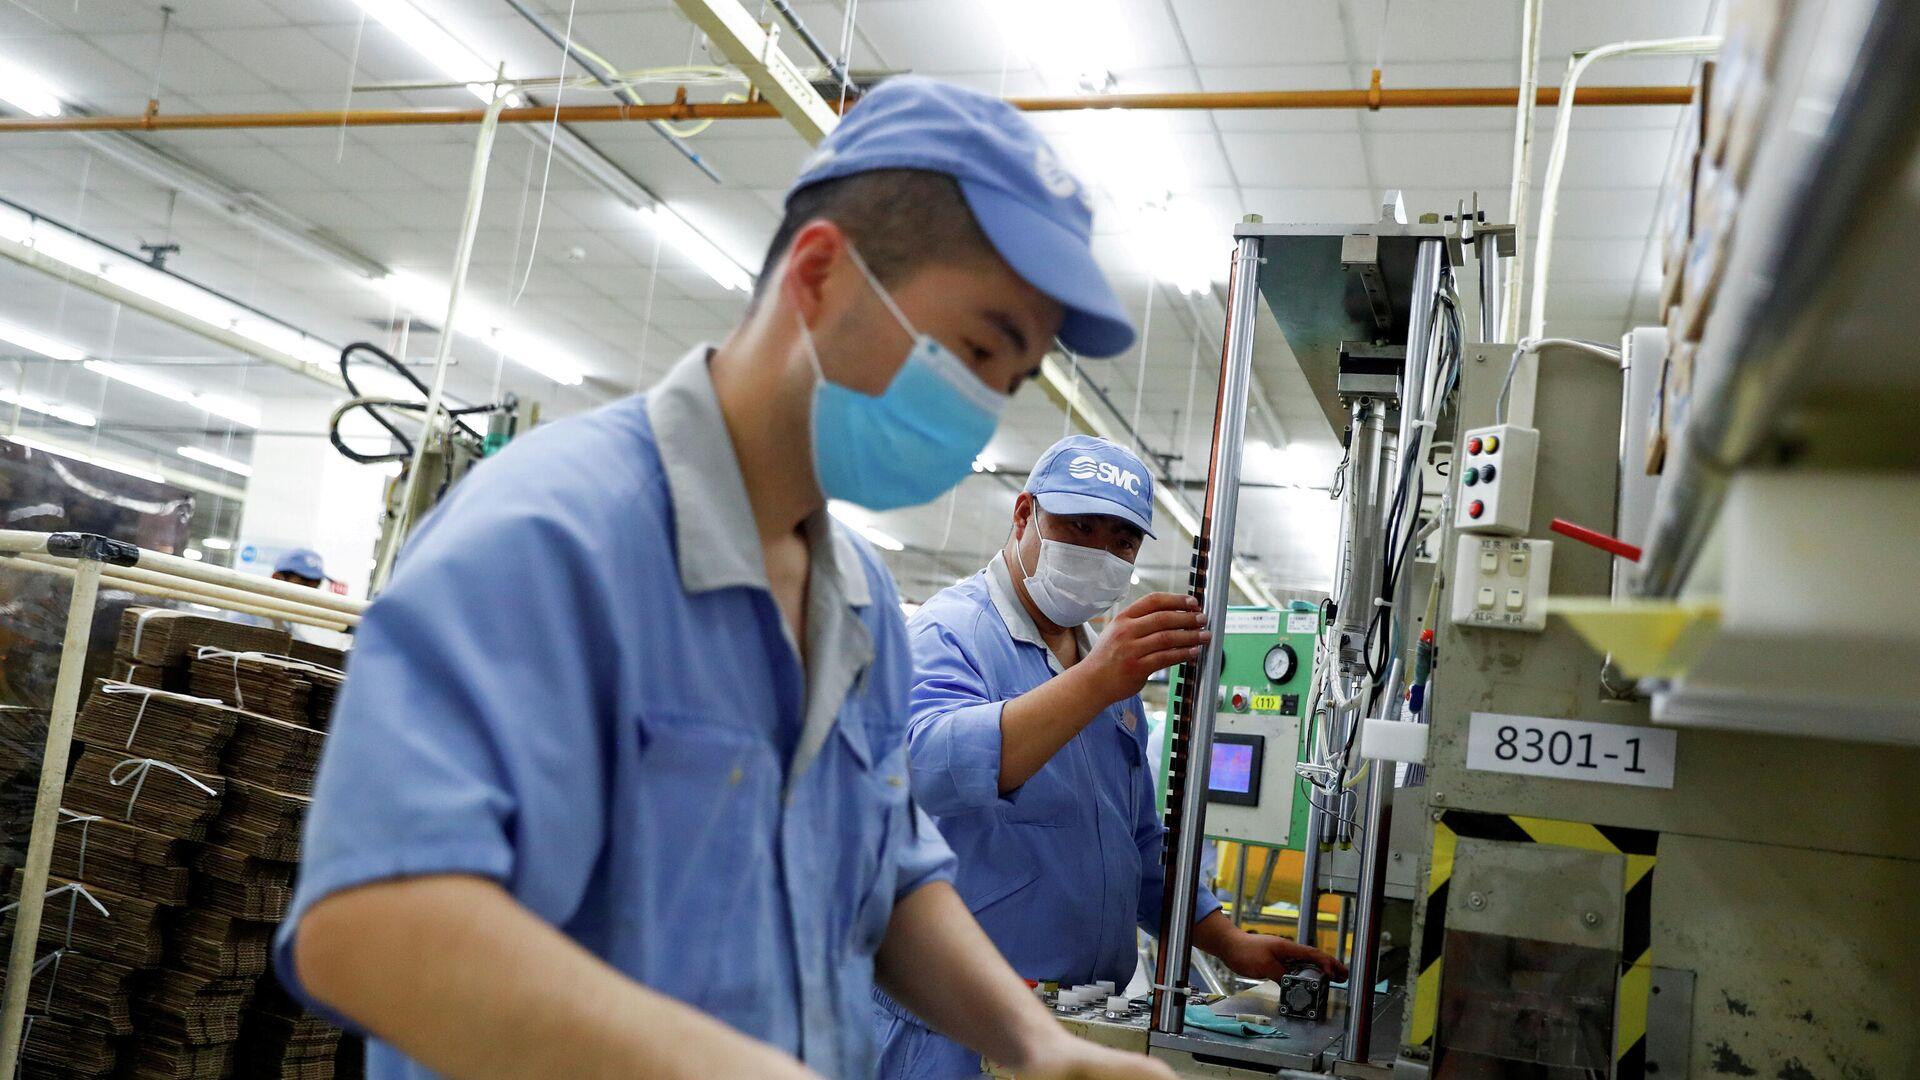 Mitarbeiter einer Fabrik in Peking - SNA, 1920, 16.04.2021